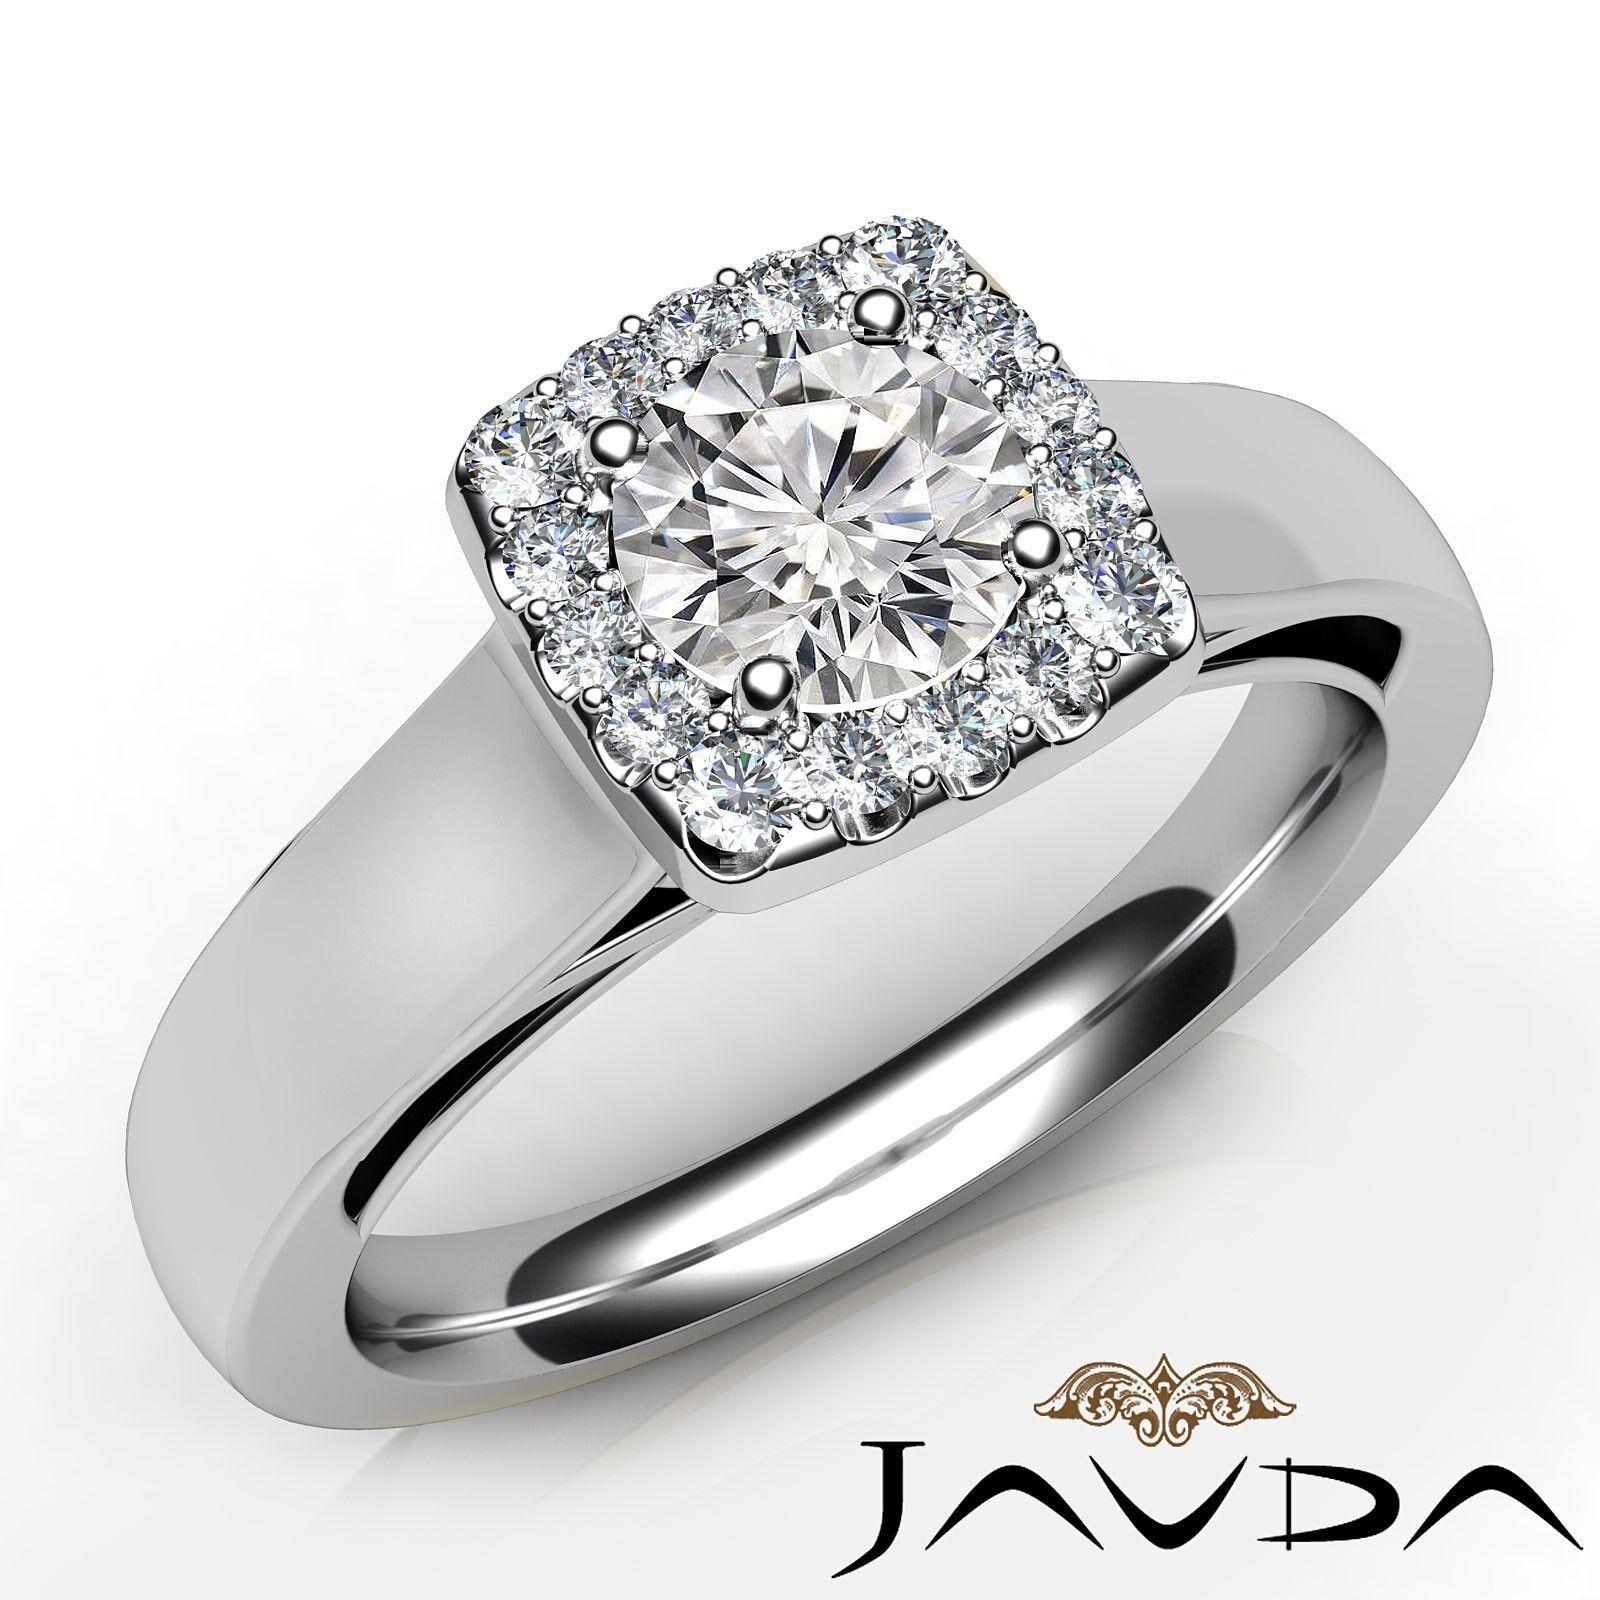 Halo Filigree Shank French U Pave Round Diamond Engagement Ring GIA E VS2 0.7Ct